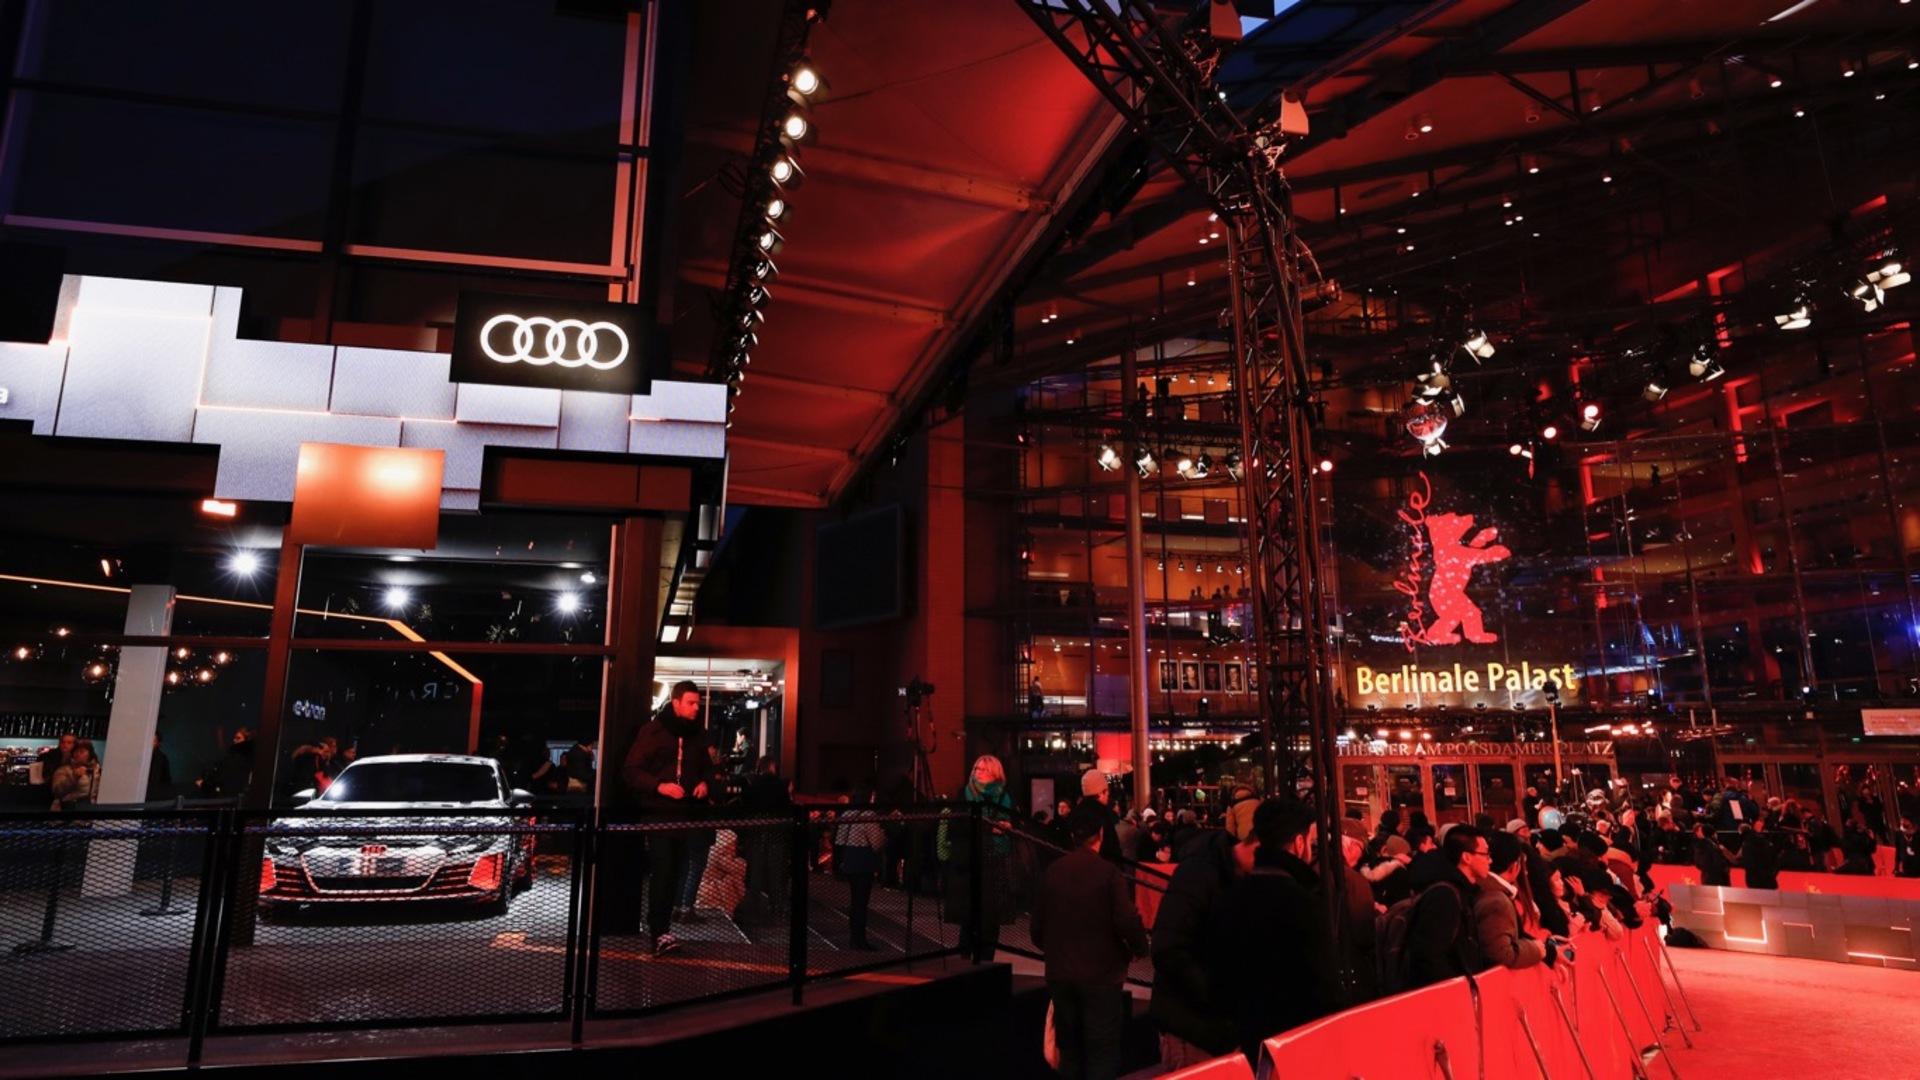 Audi e-tron meets Berlinale: elektrisch zum roten Teppich